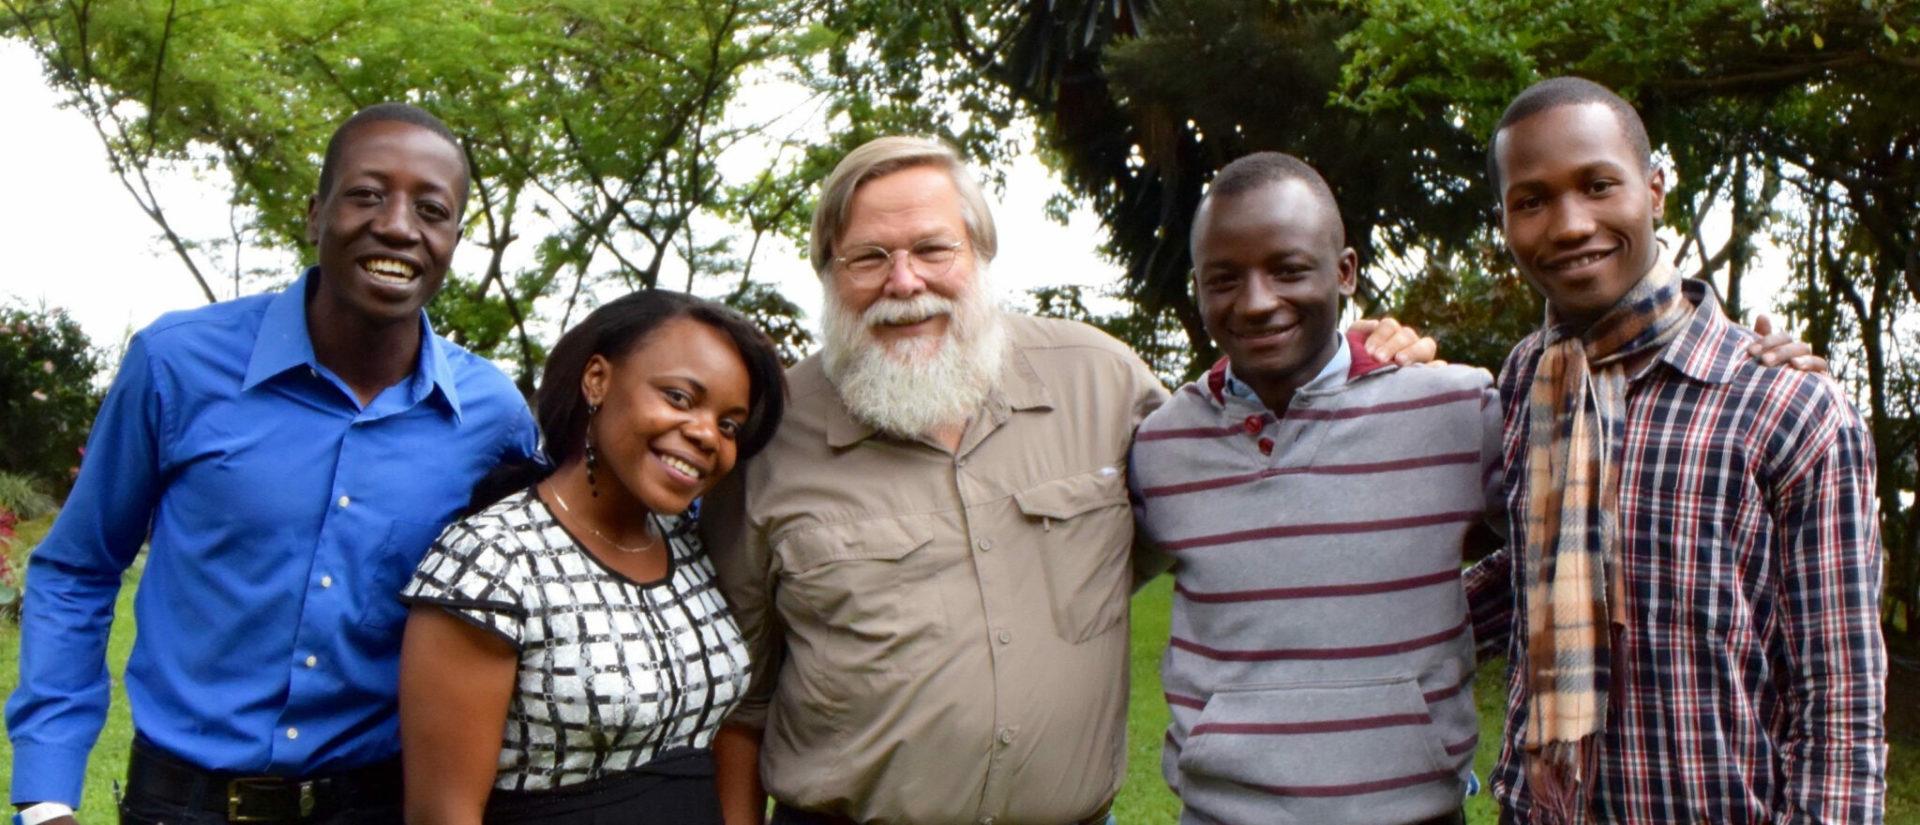 Paul Robinson of The Congo Initiative